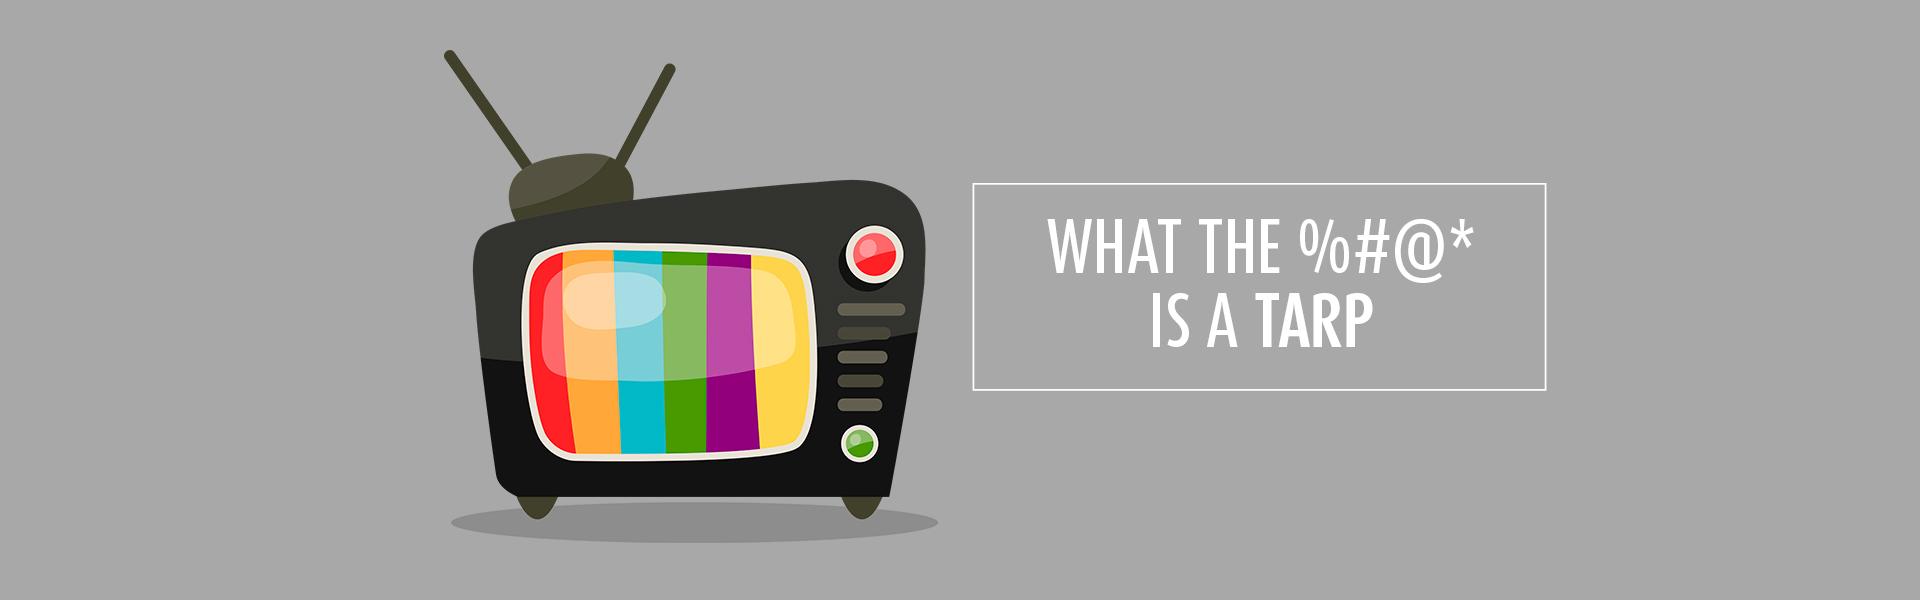 TARP, TV, ADVERTISING, MARKETING